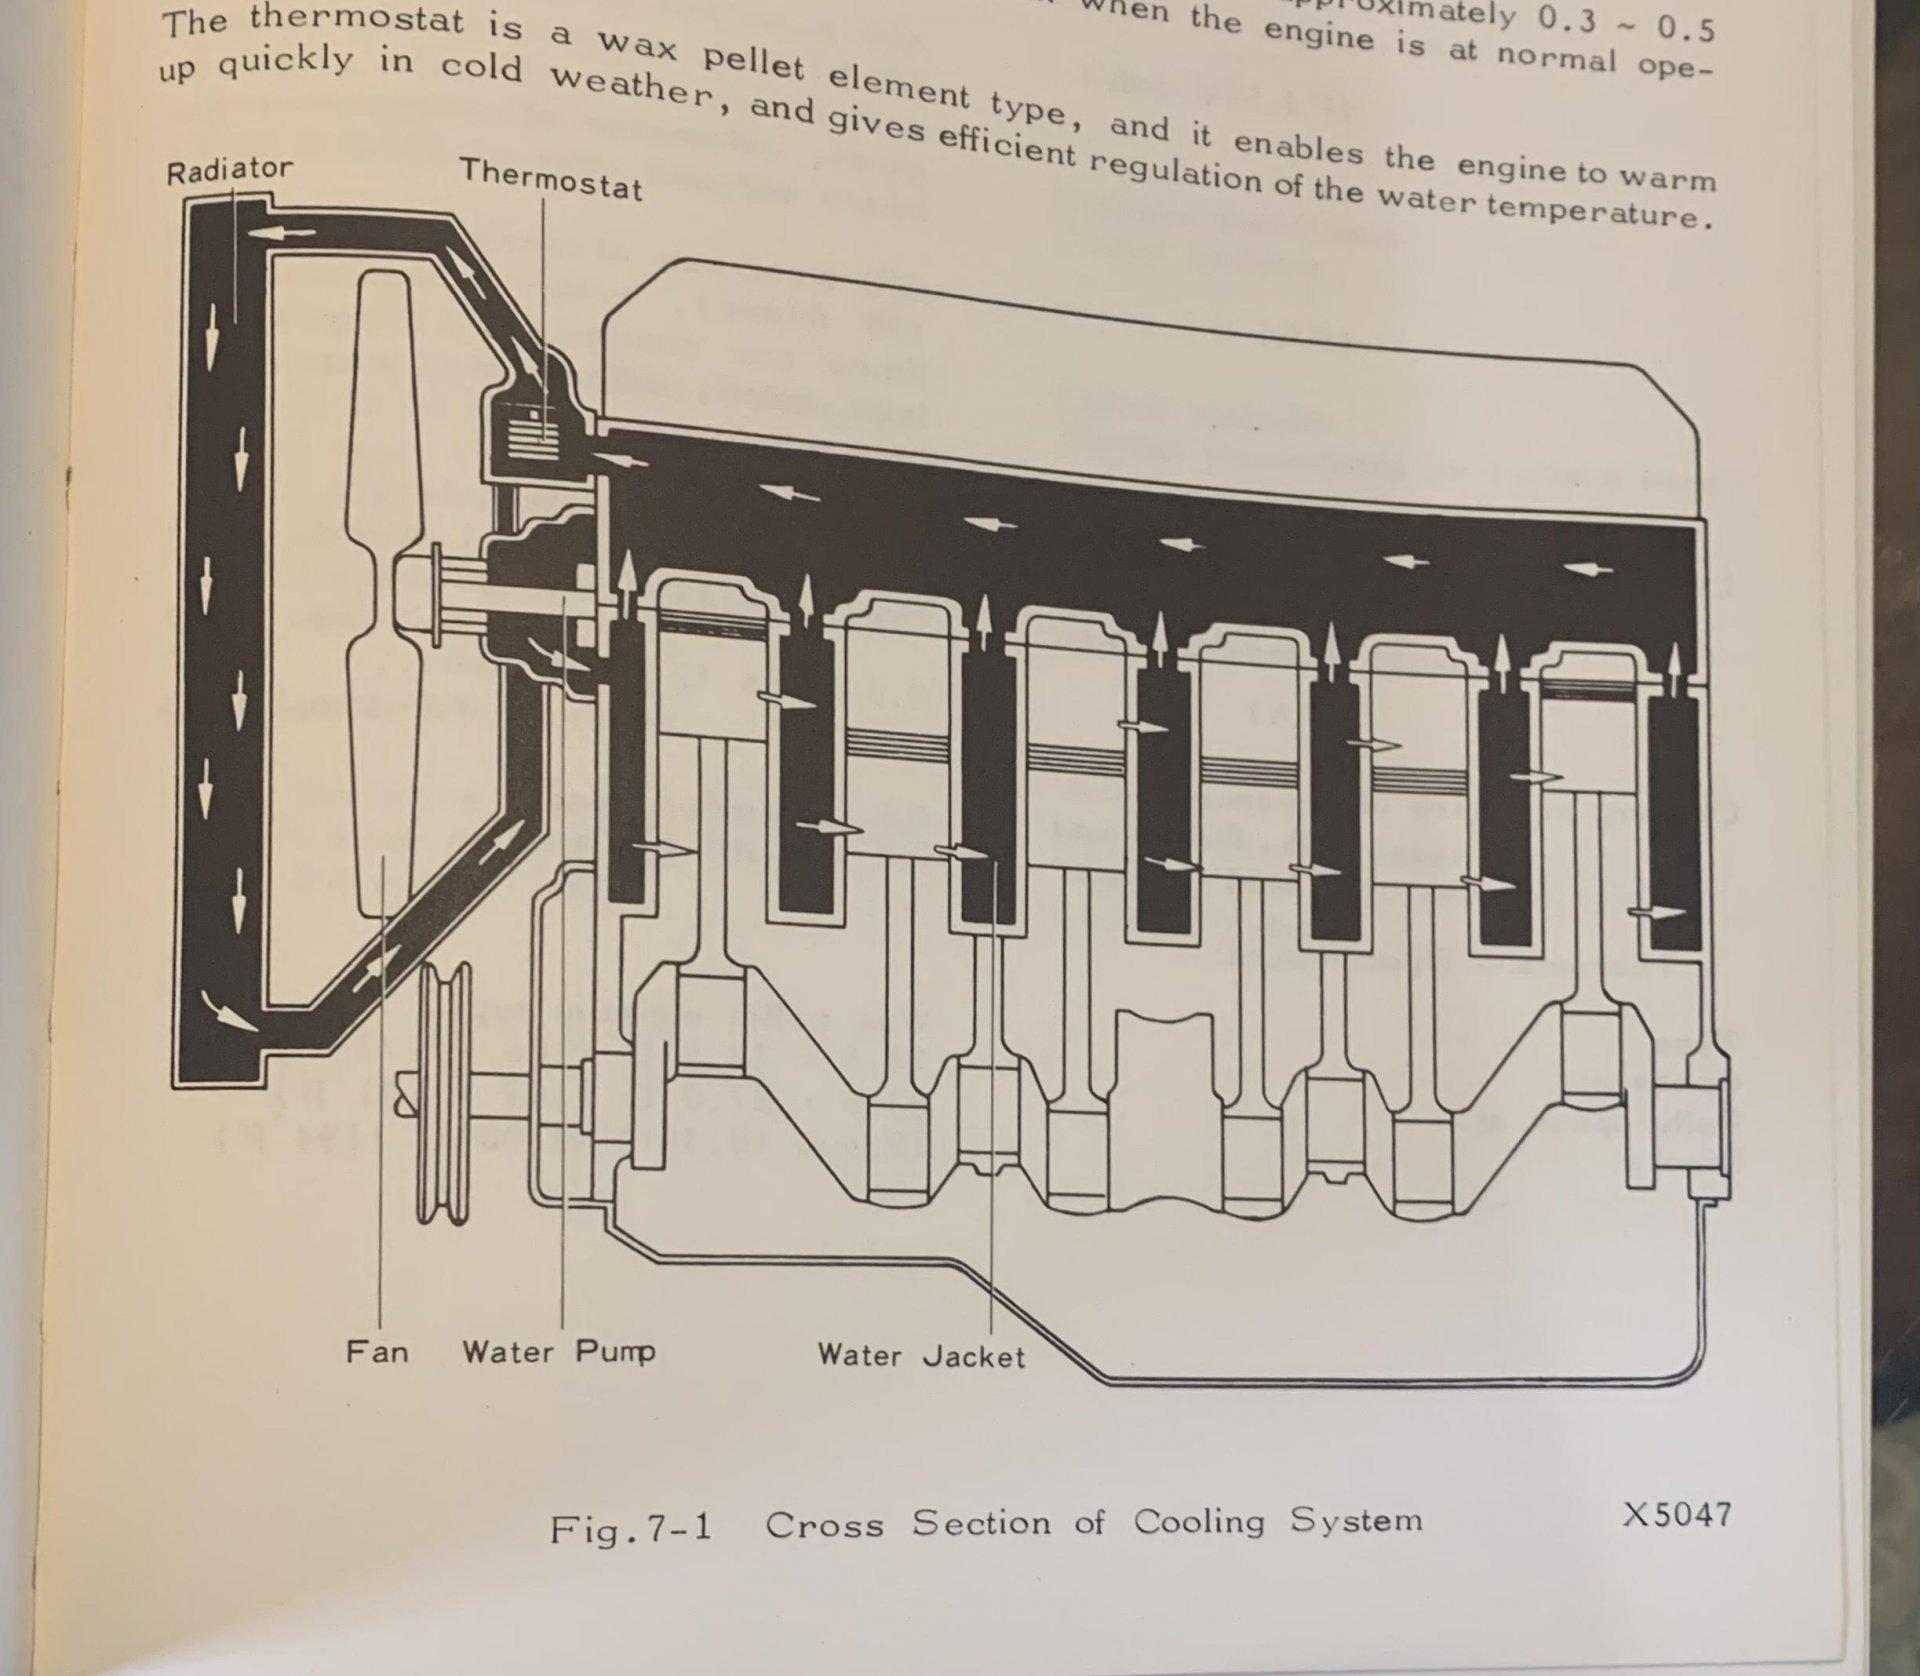 Radiator Flow Overview.jpg